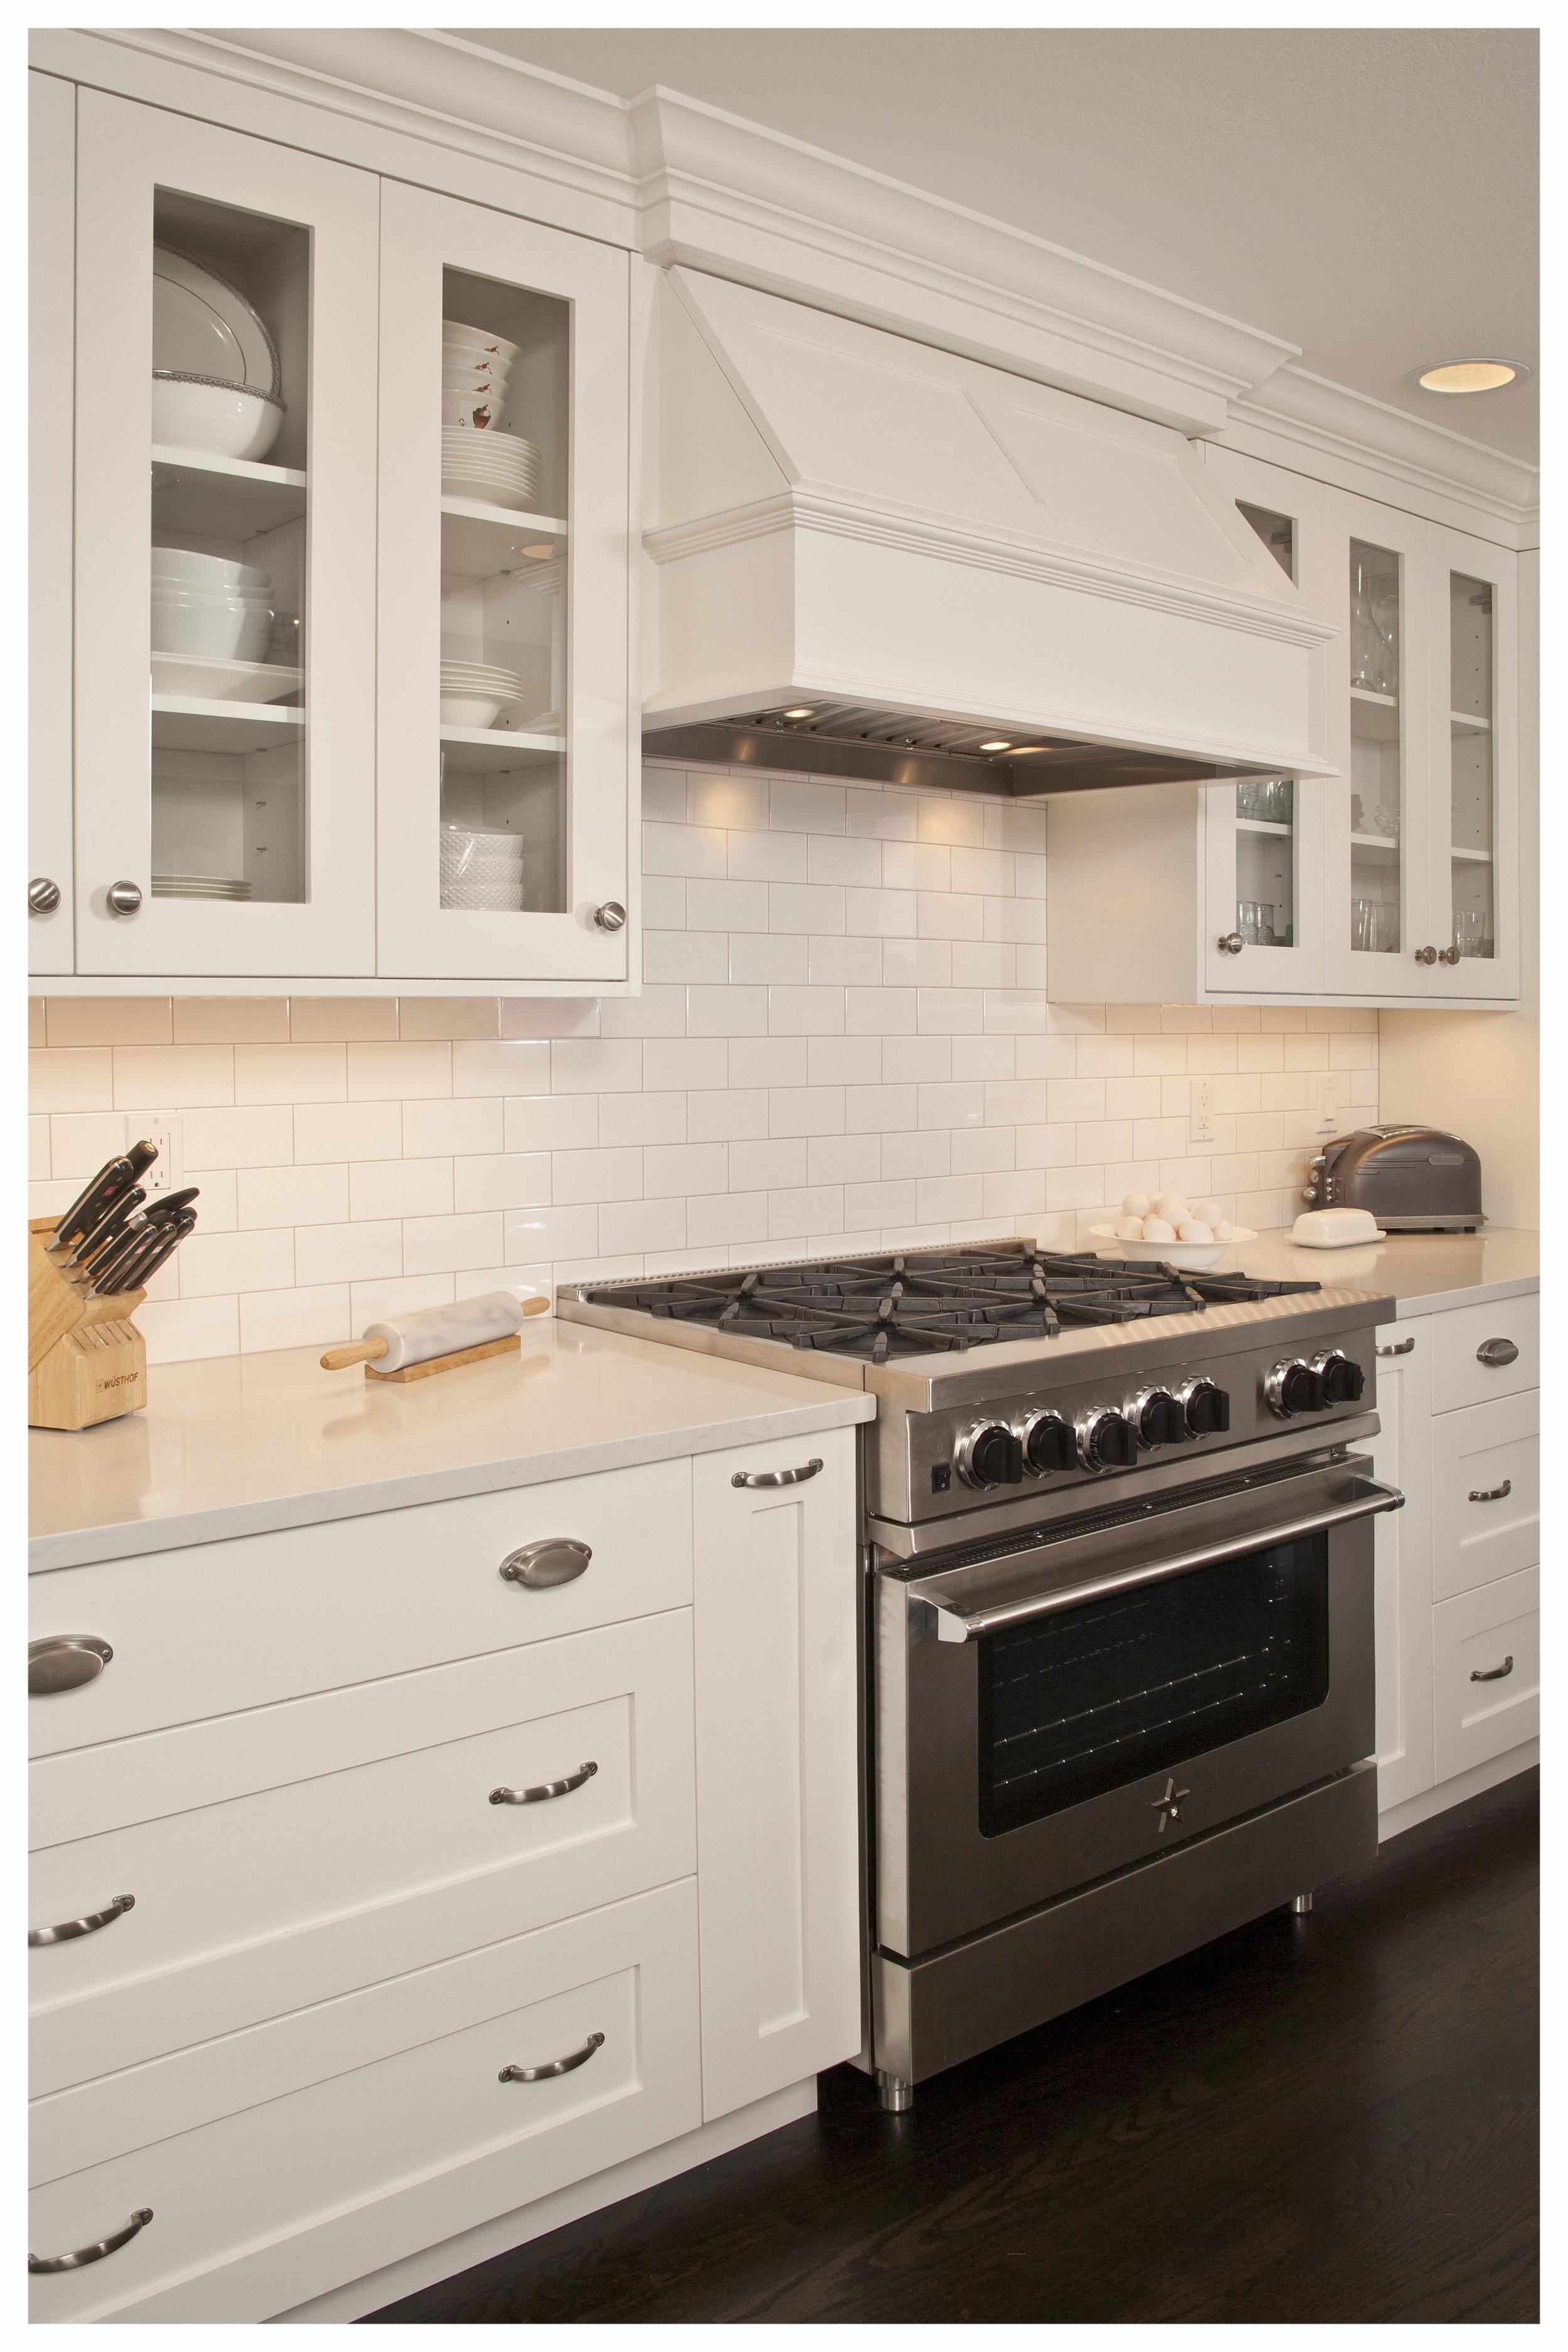 English Hill Transitional Kitchen 6.jpg